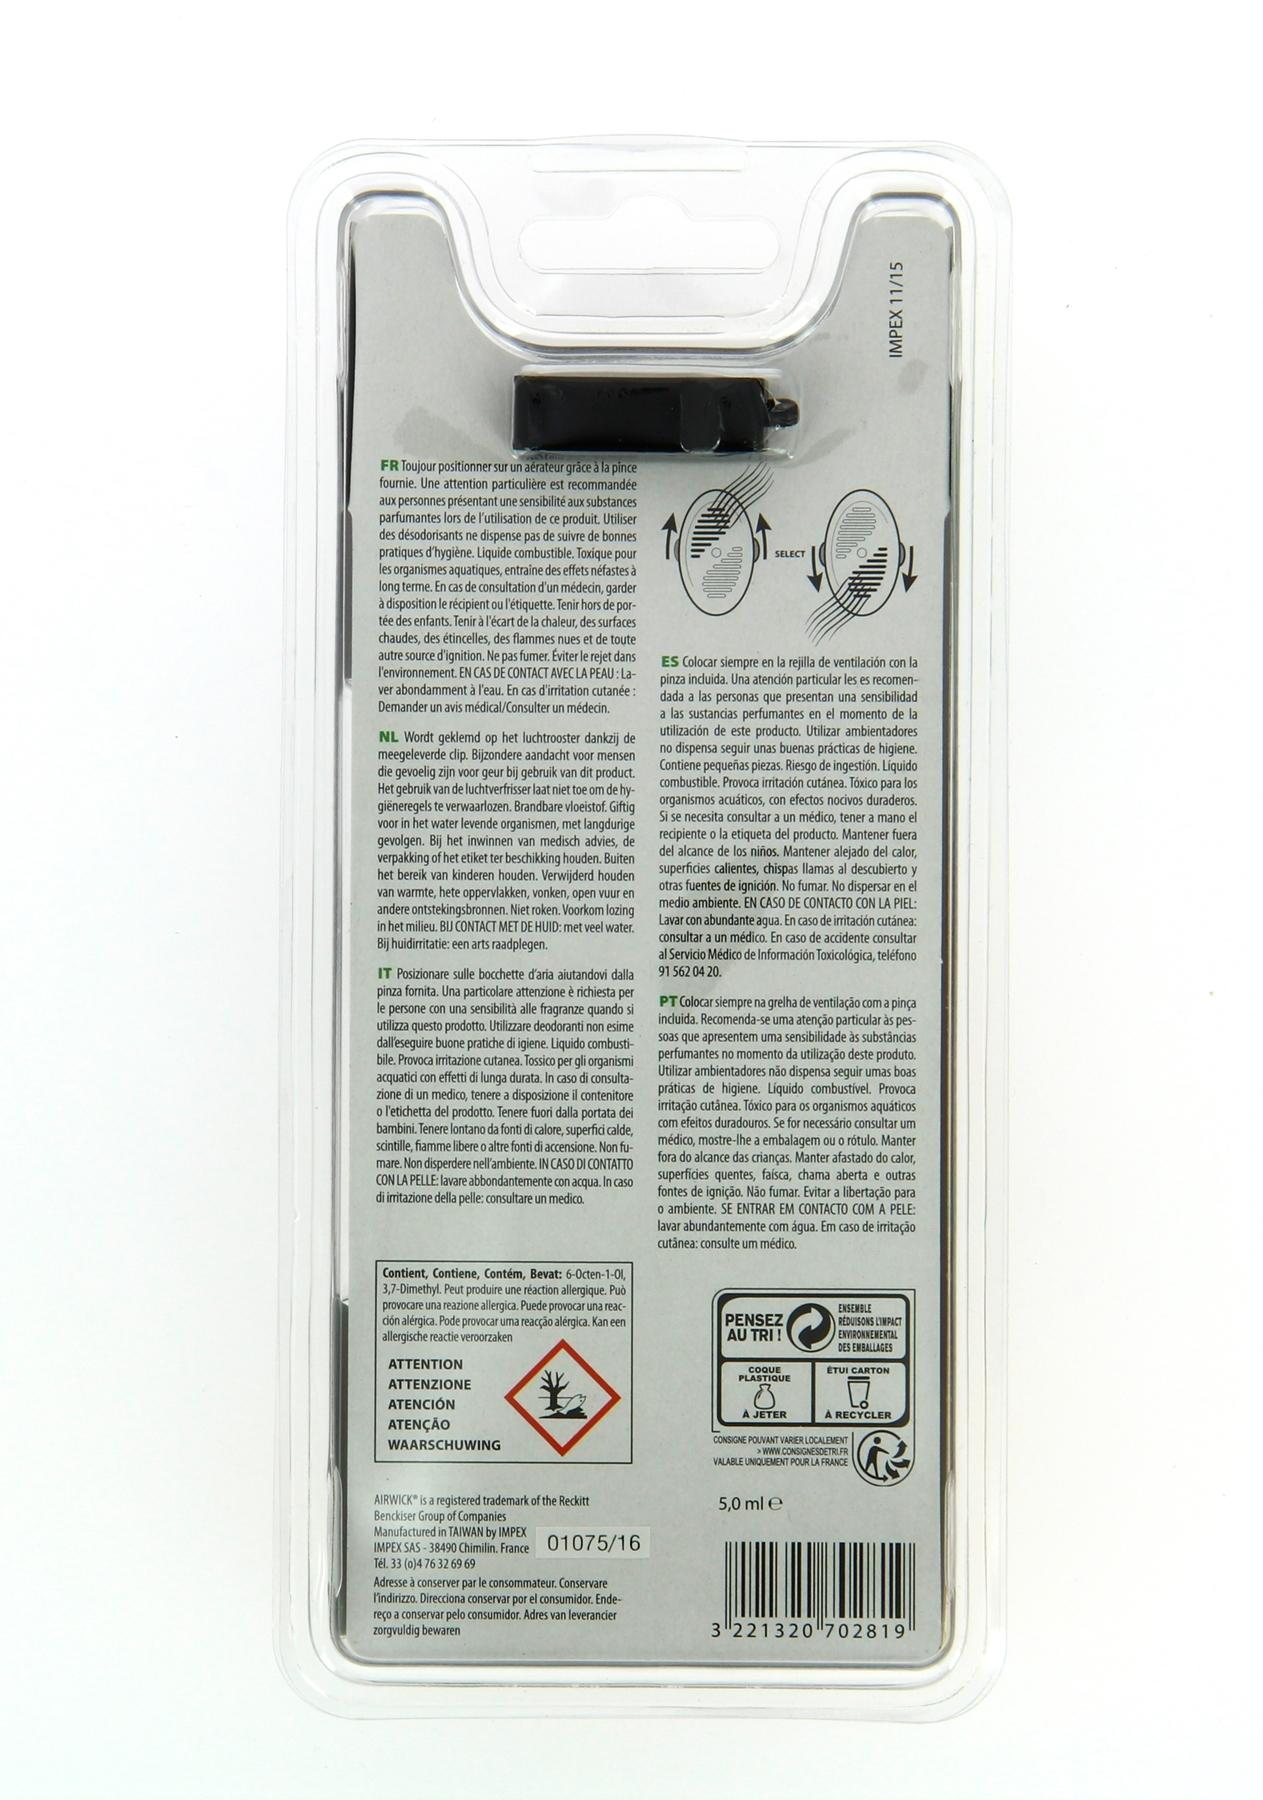 Lufterfrischer AIR WICK 070281 Bewertung